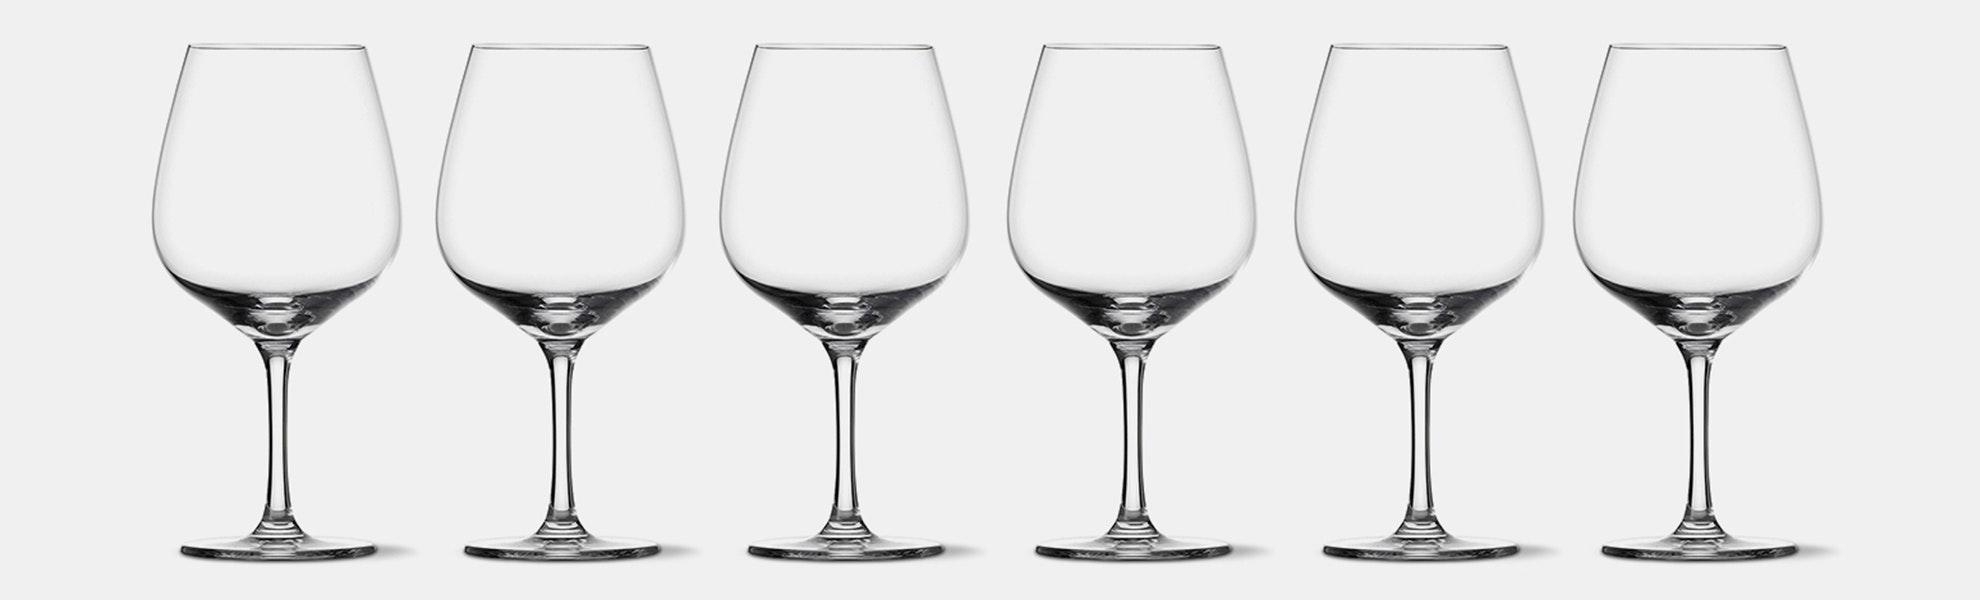 Schott Zwiesel Congresso Wine Glass (Set of 6)